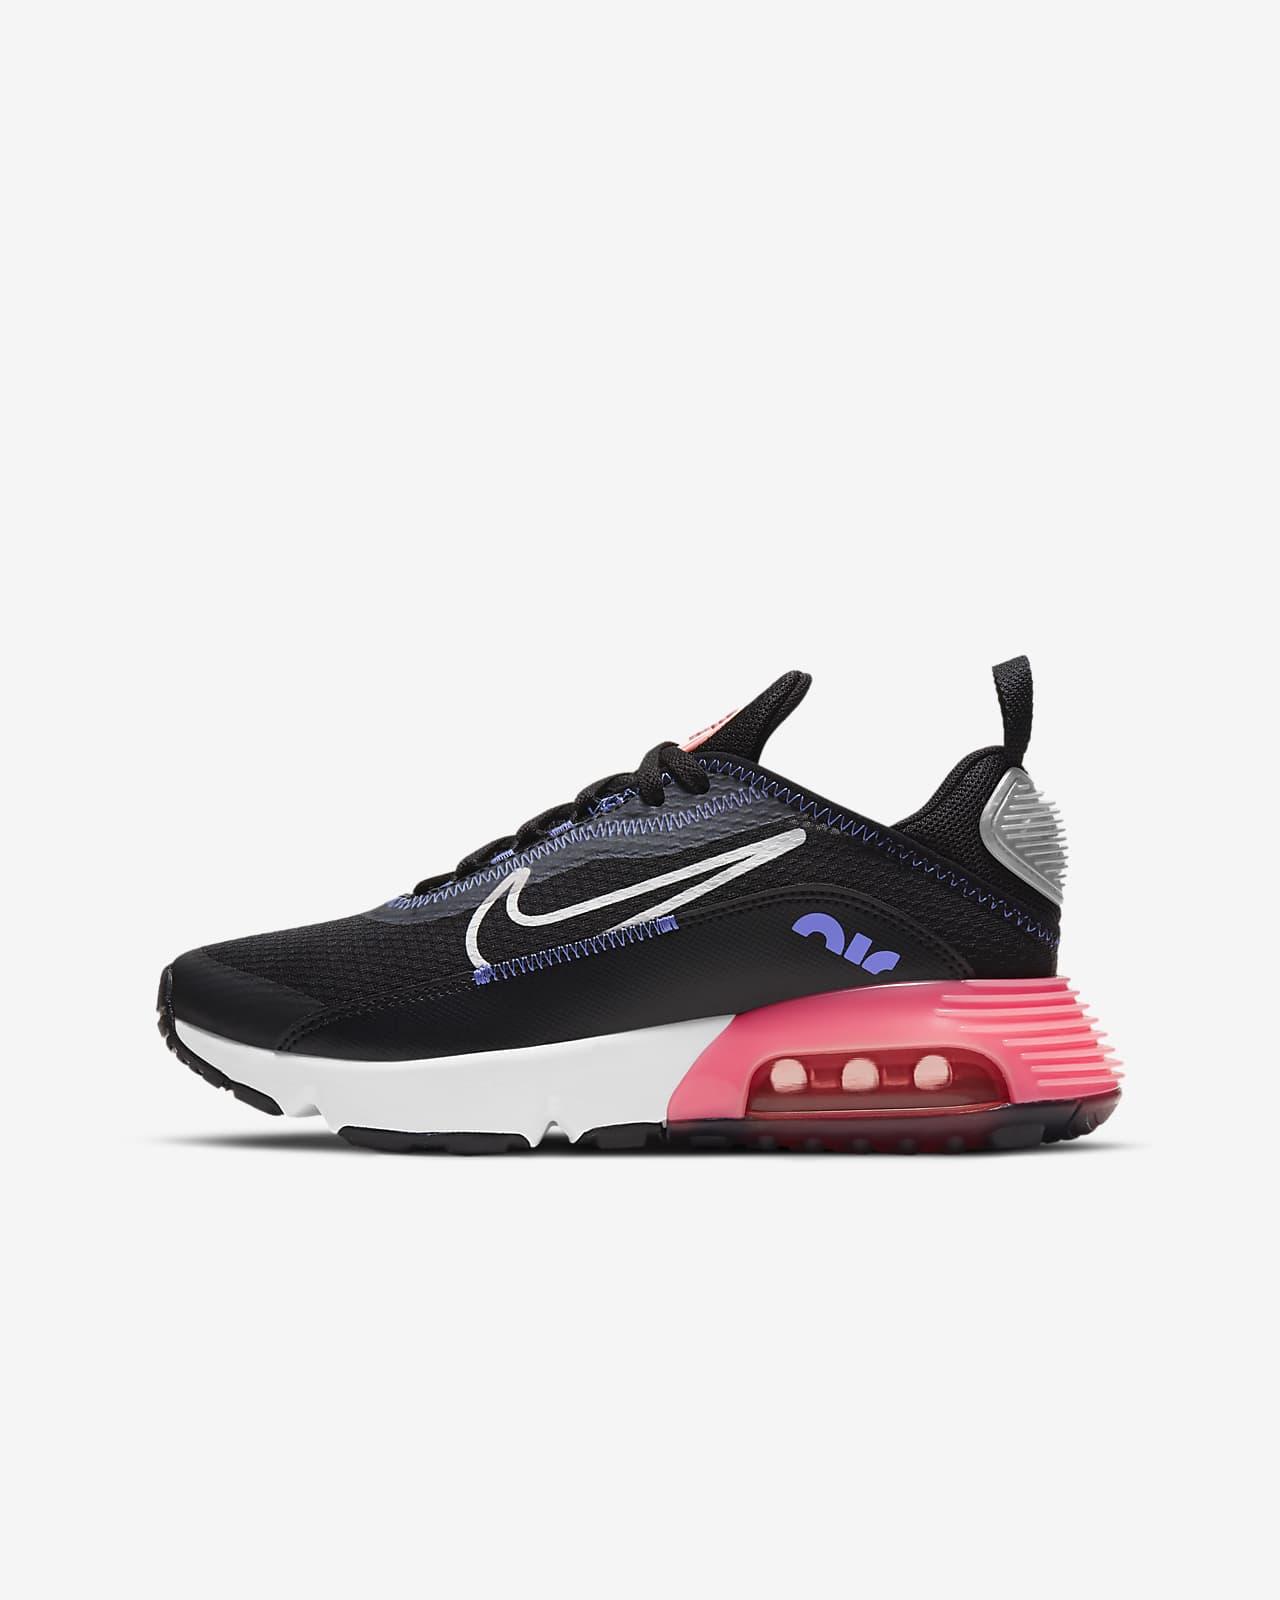 Nike Air Max 2090 Big Kids' Shoe